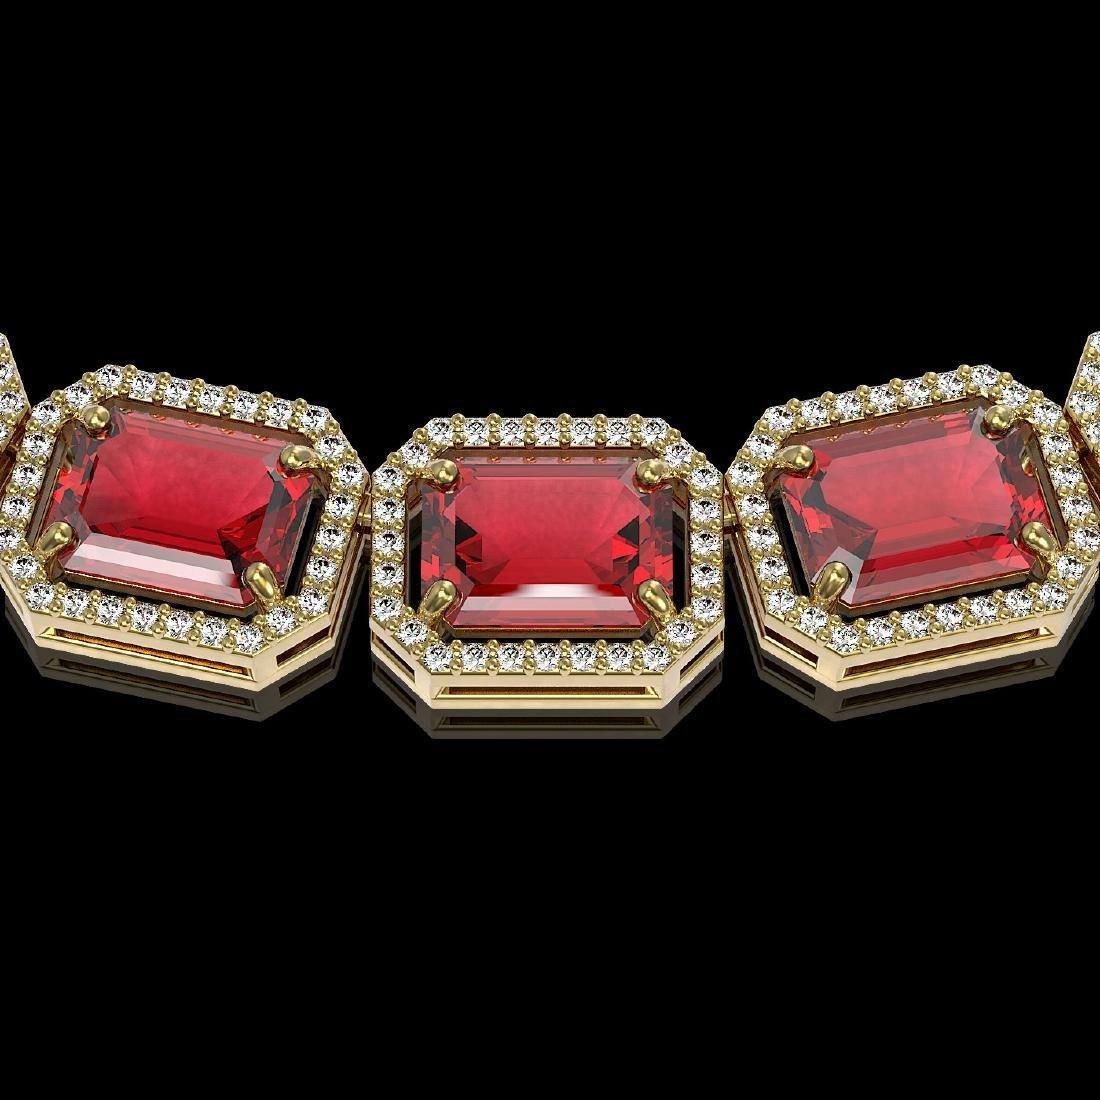 80.32 CTW Tourmaline & Diamond Halo Necklace 10K Yellow - 3